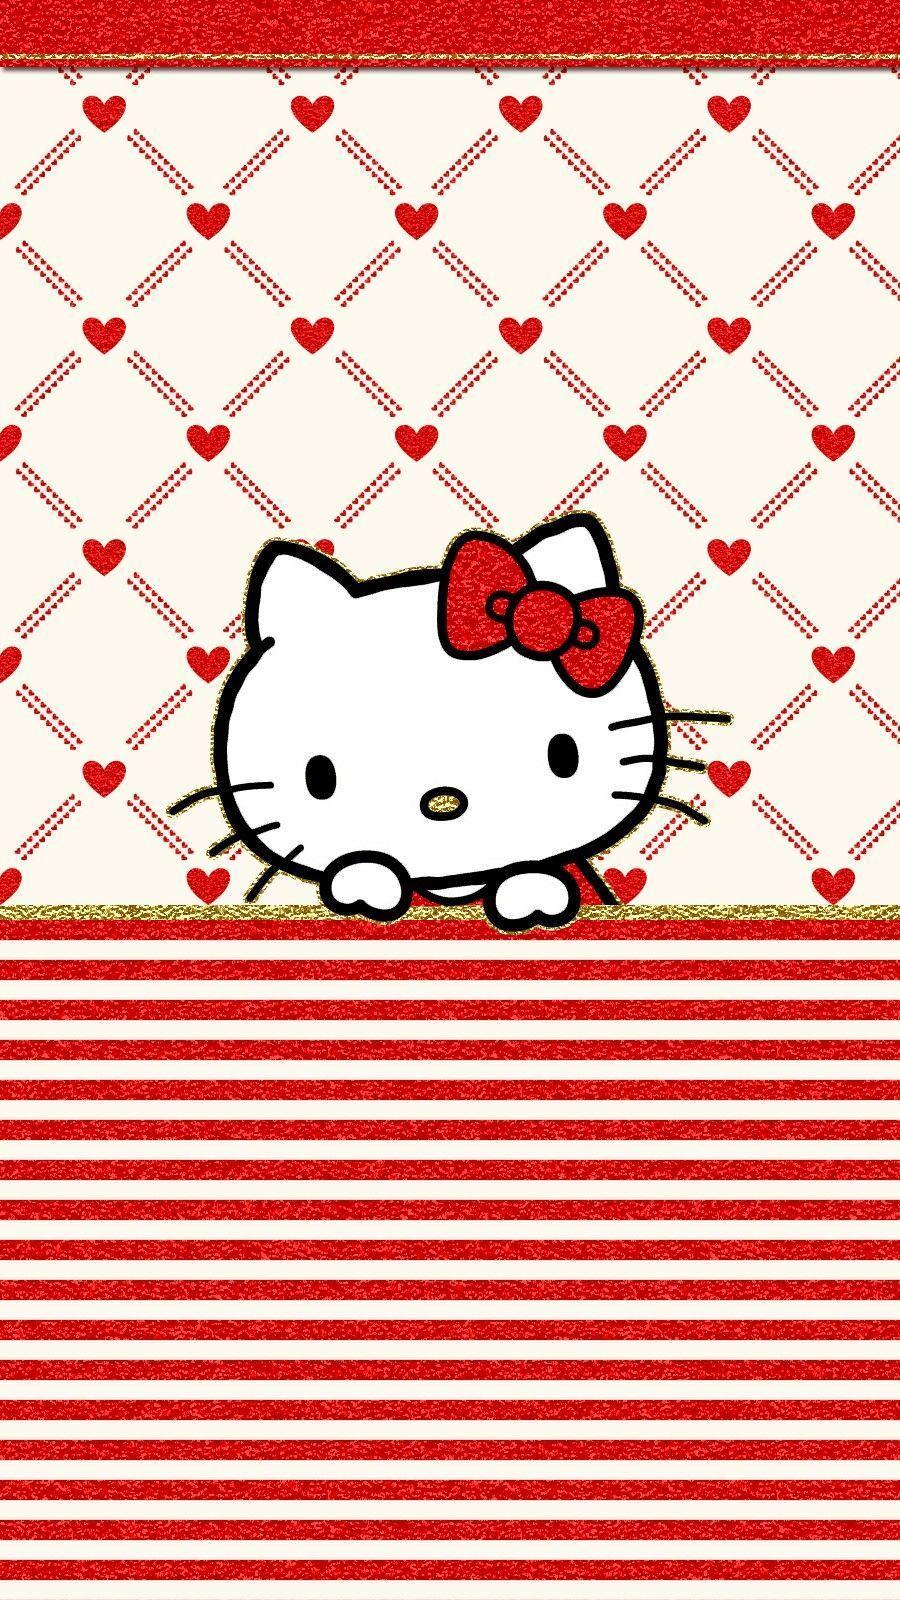 900x1600 iPhone Wall: Valentine's Day tjn. Hello kitty. Hello kitty